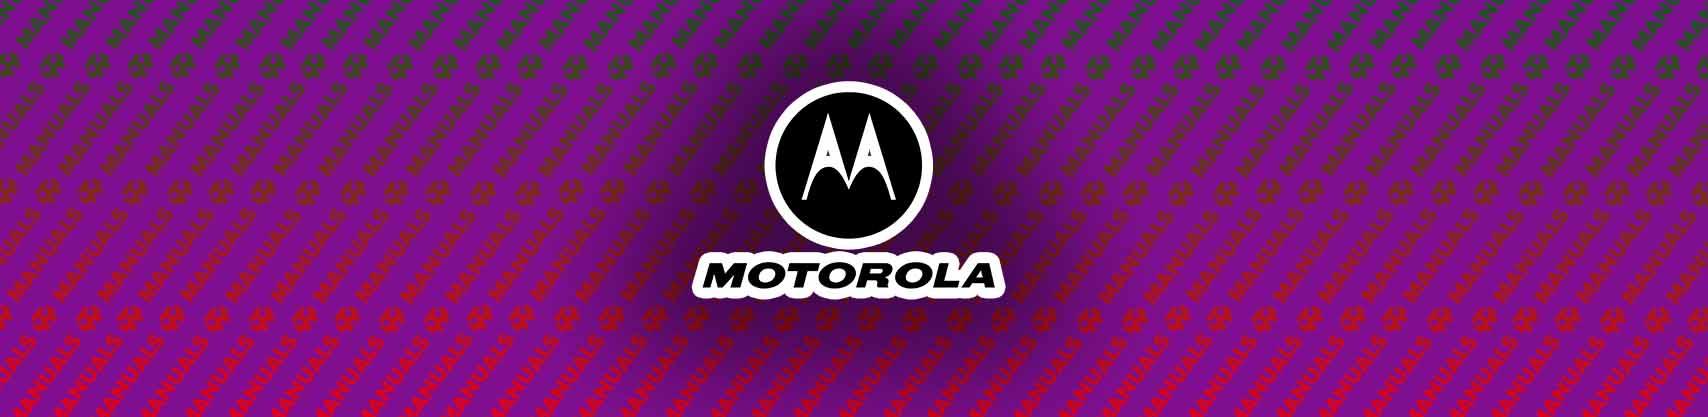 Motorola MG7550 Manual